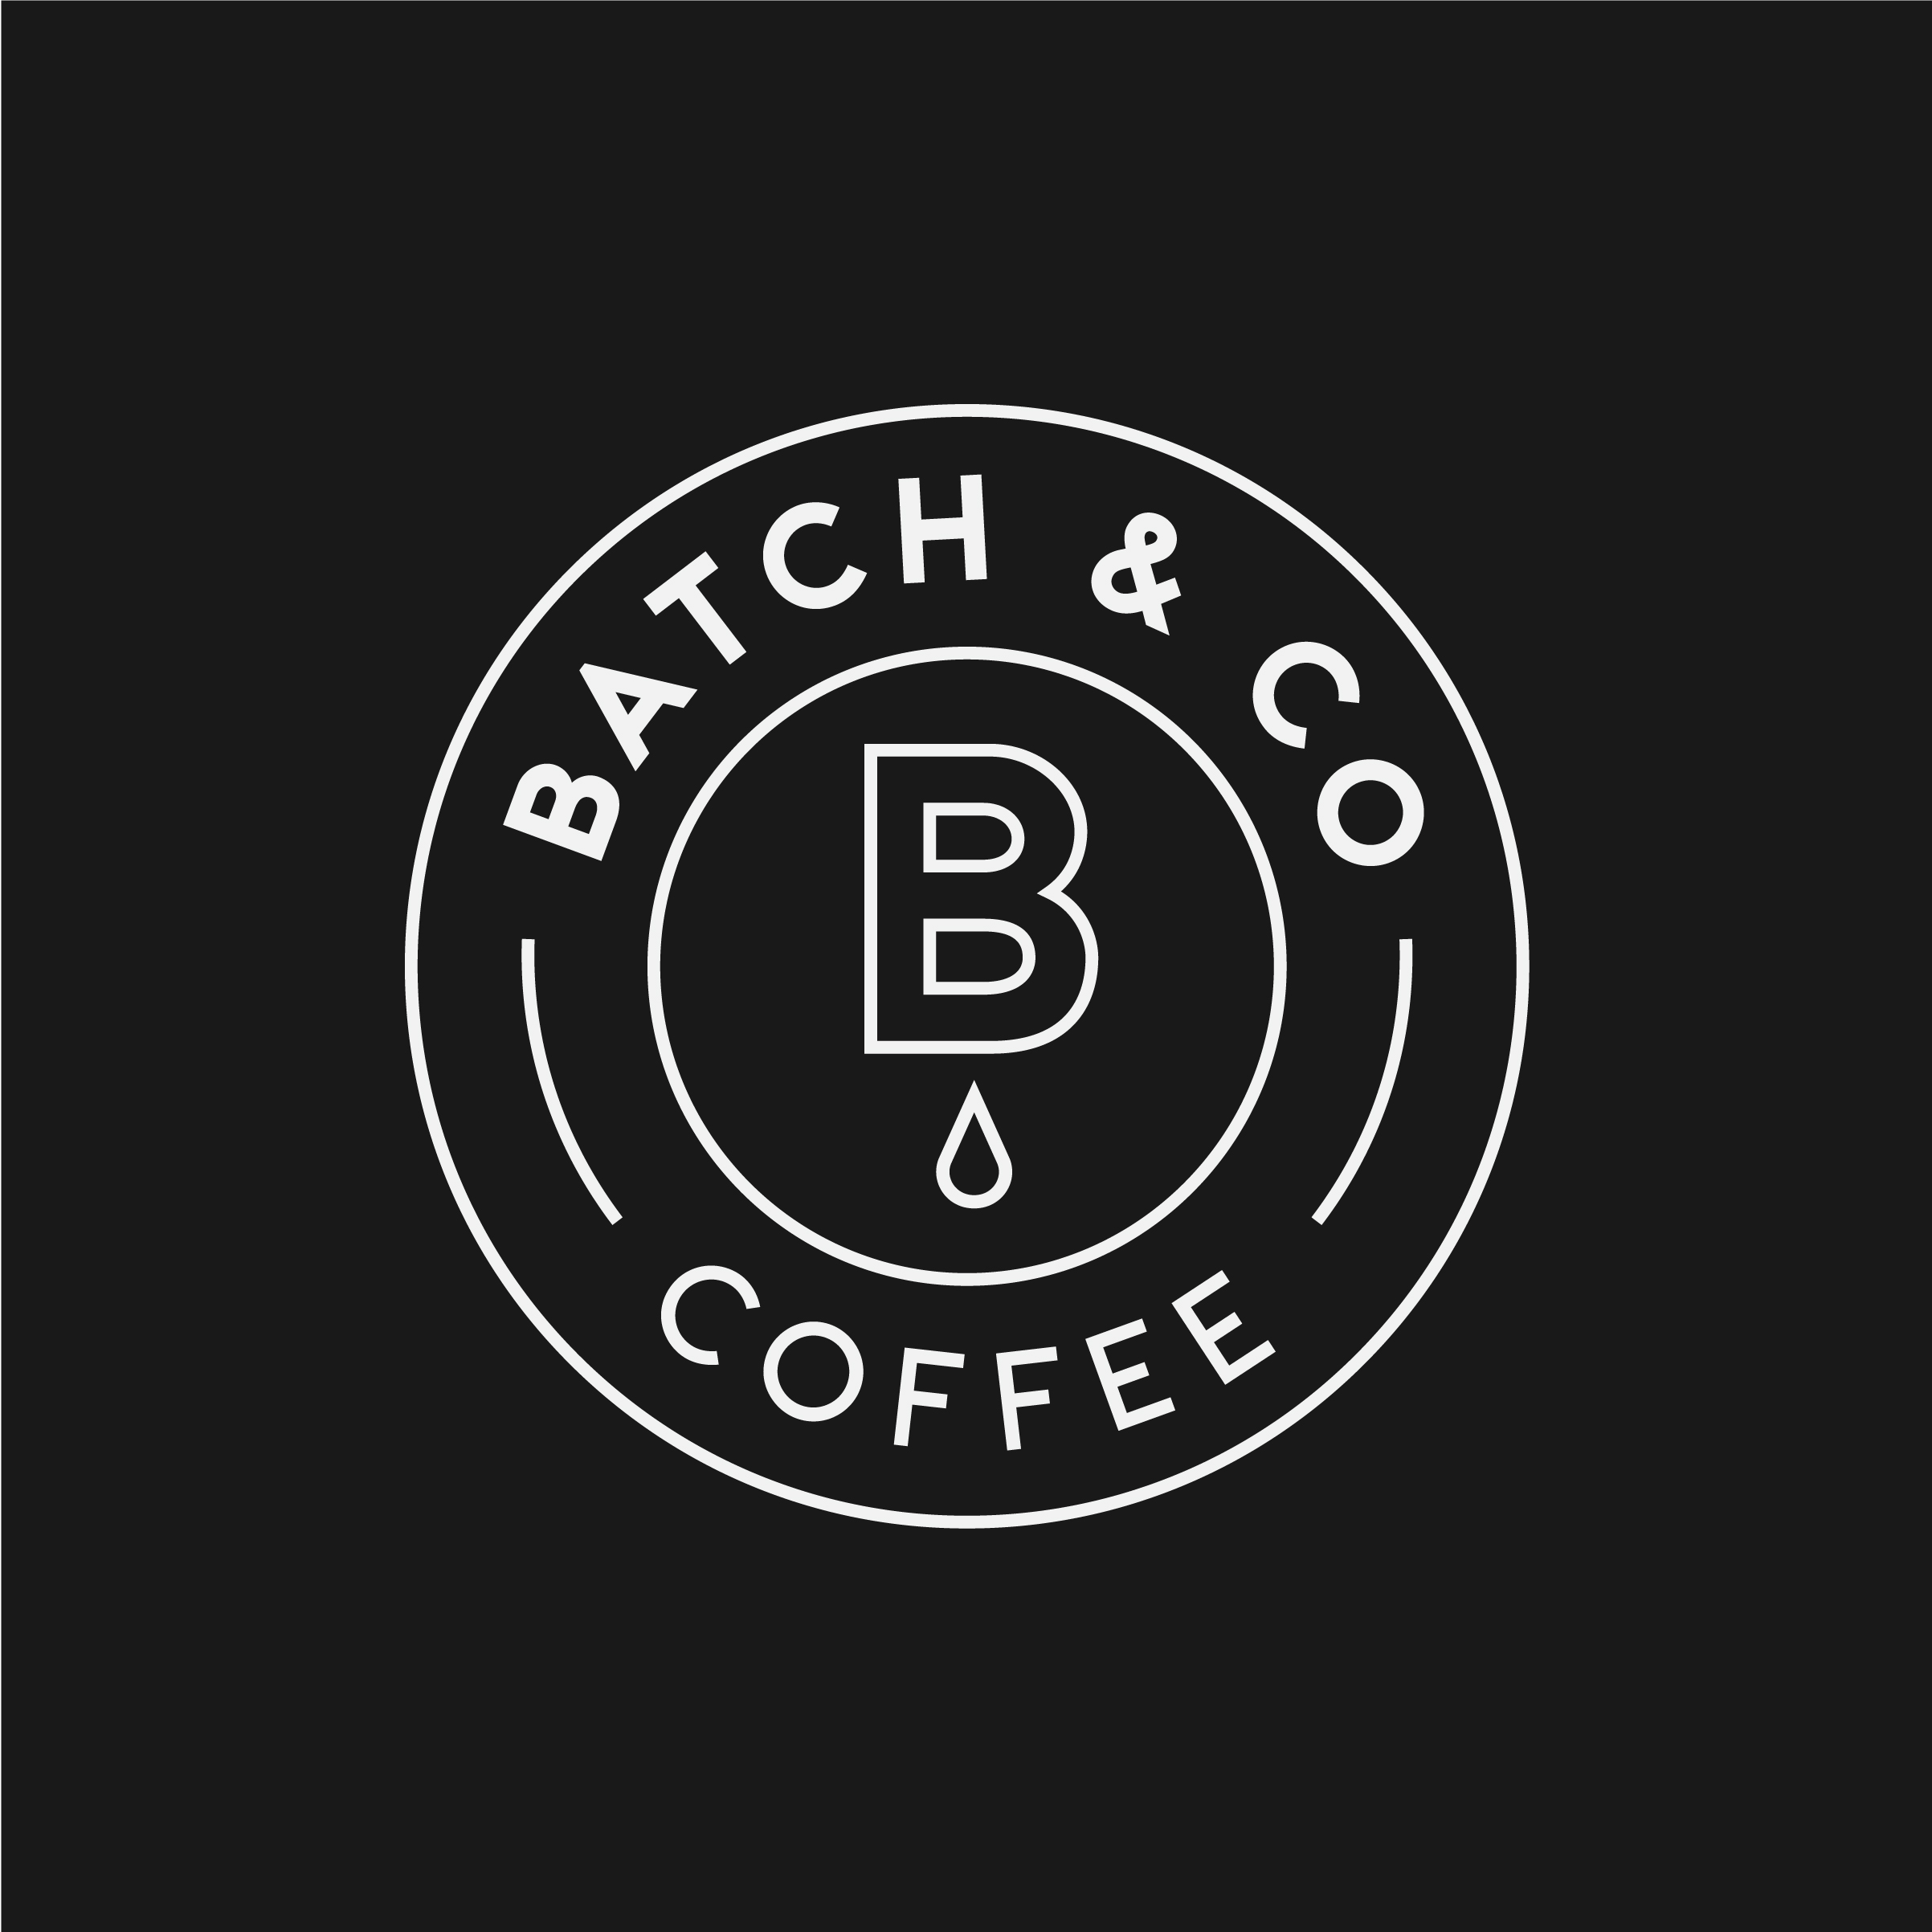 Batch & Co Coffee